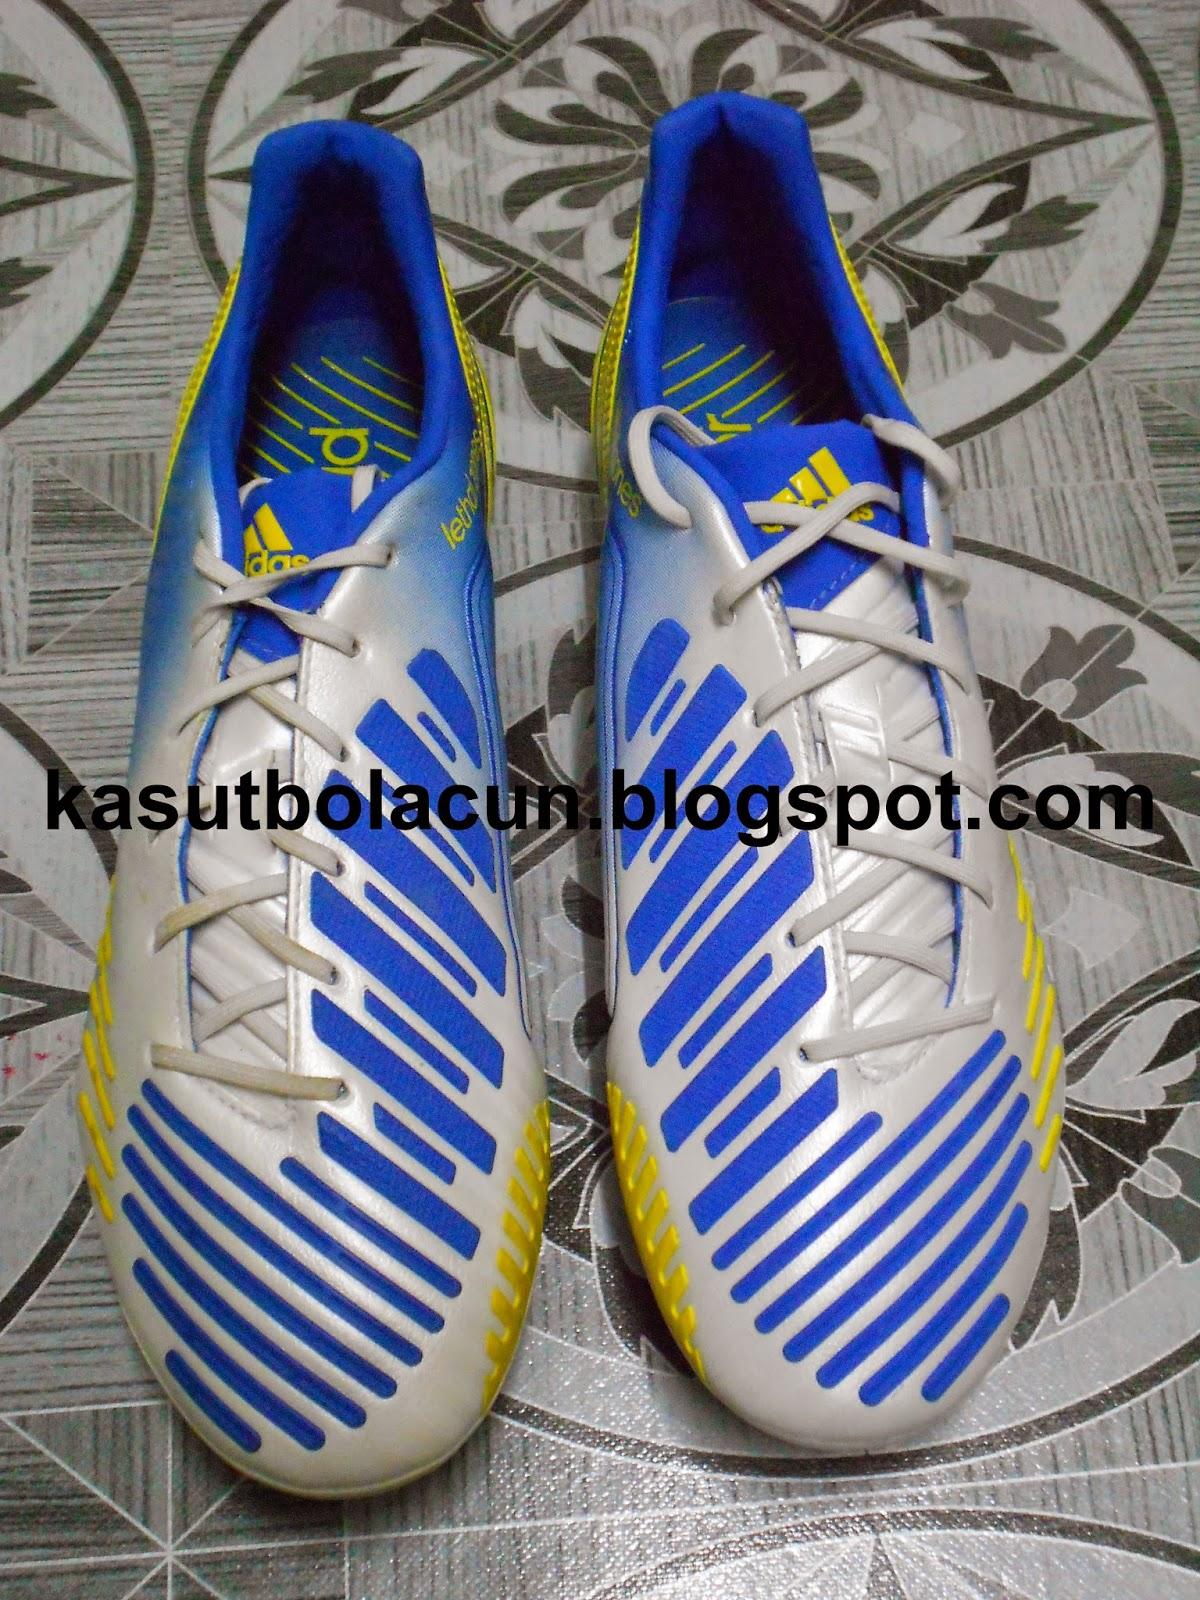 http://kasutbolacun.blogspot.com/2015/01/adidas-predator-lz-1-sg.html